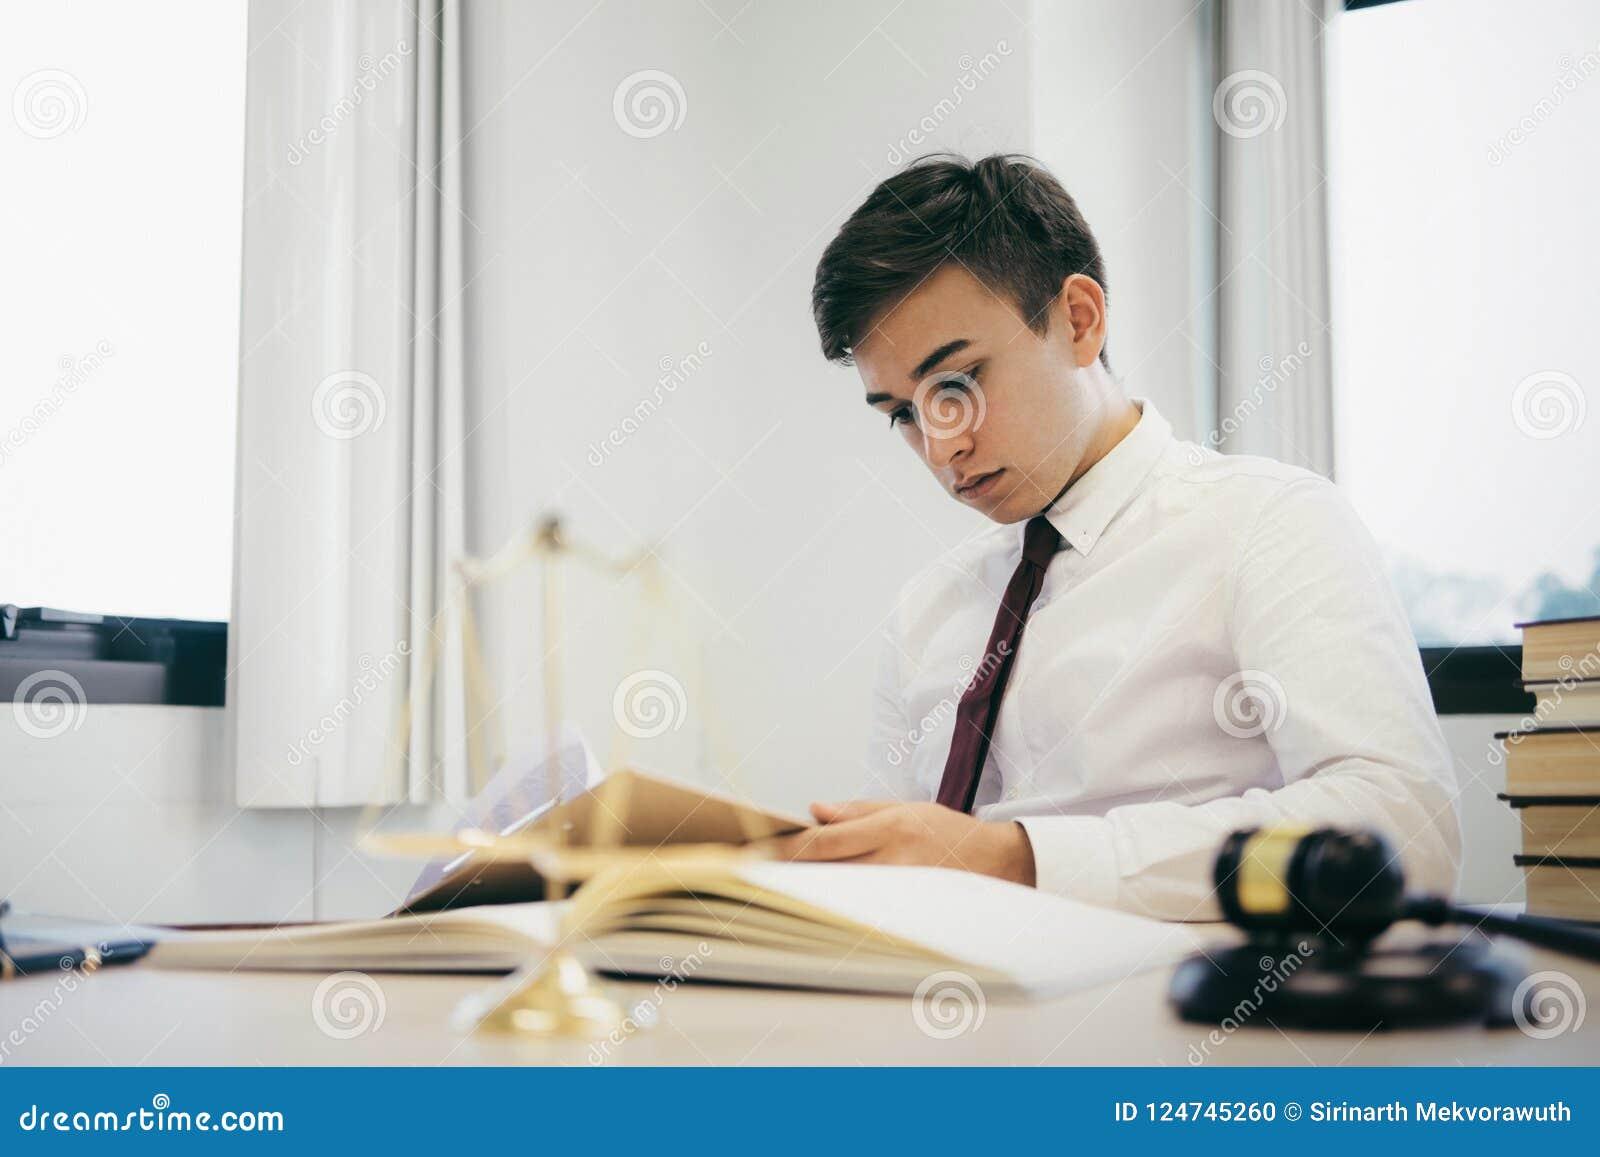 Работа юриста в офисе